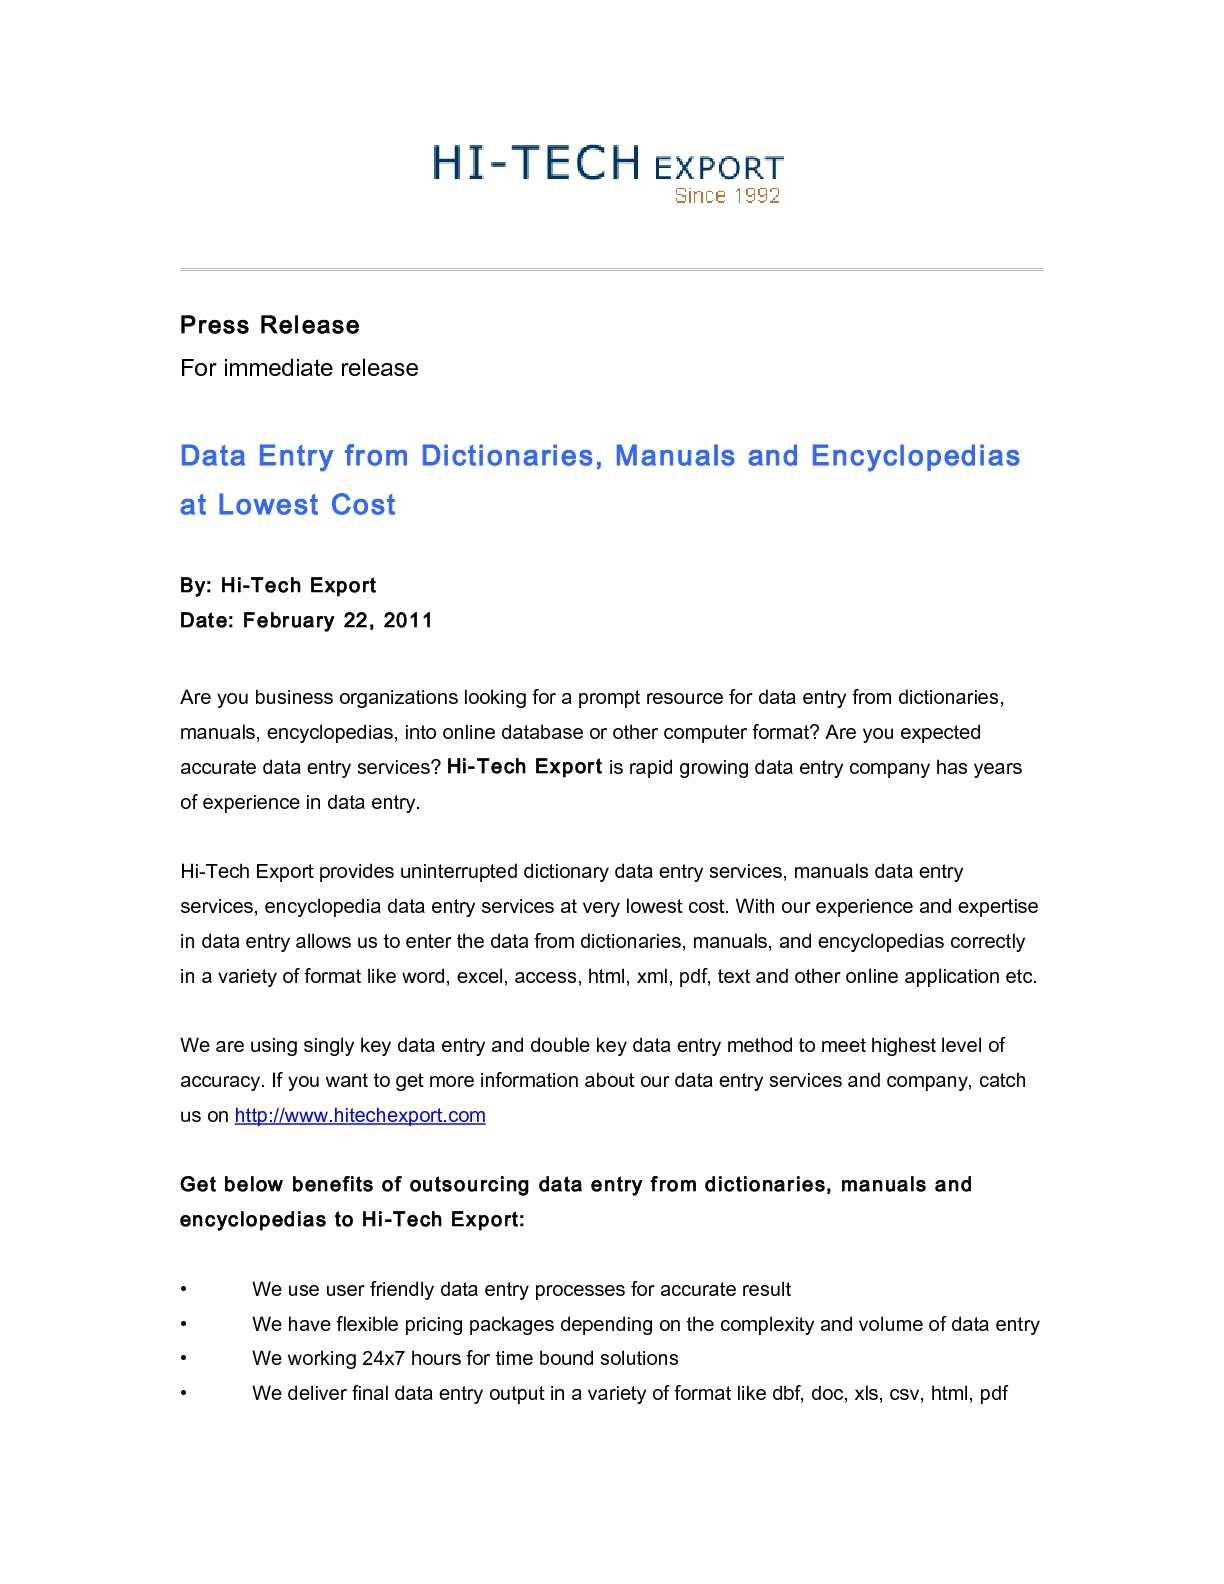 calaméo data entry from dictionaries, manuals and encyclopedias at